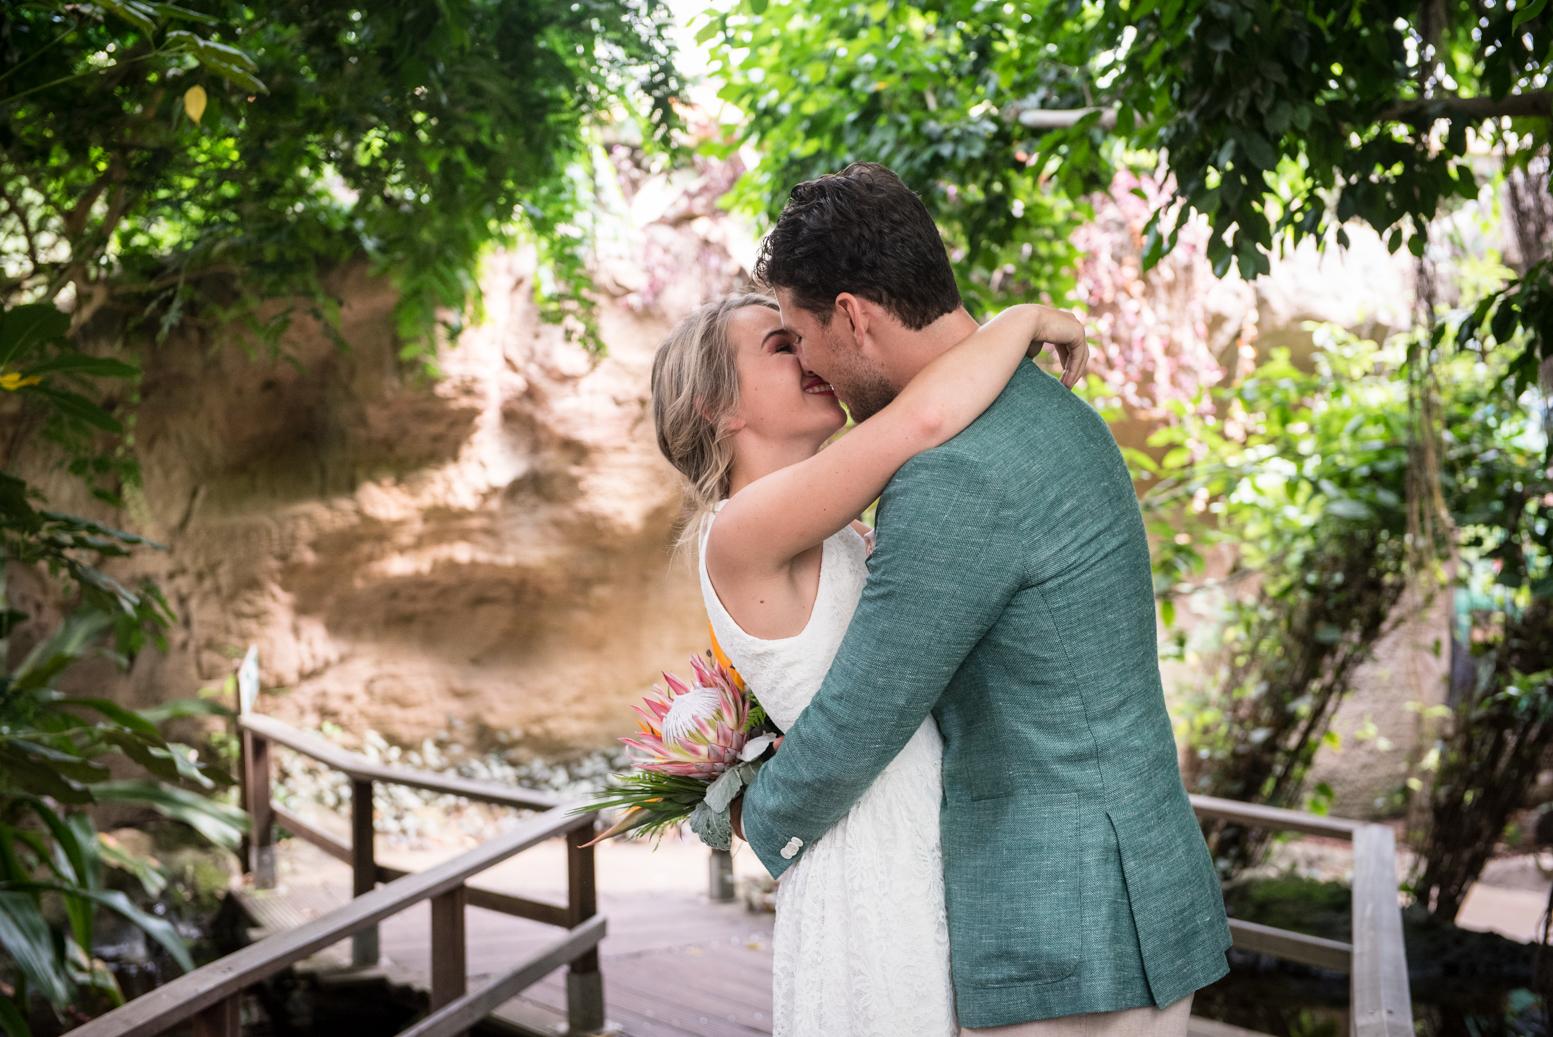 groen trouwpak korte bruidsjurk